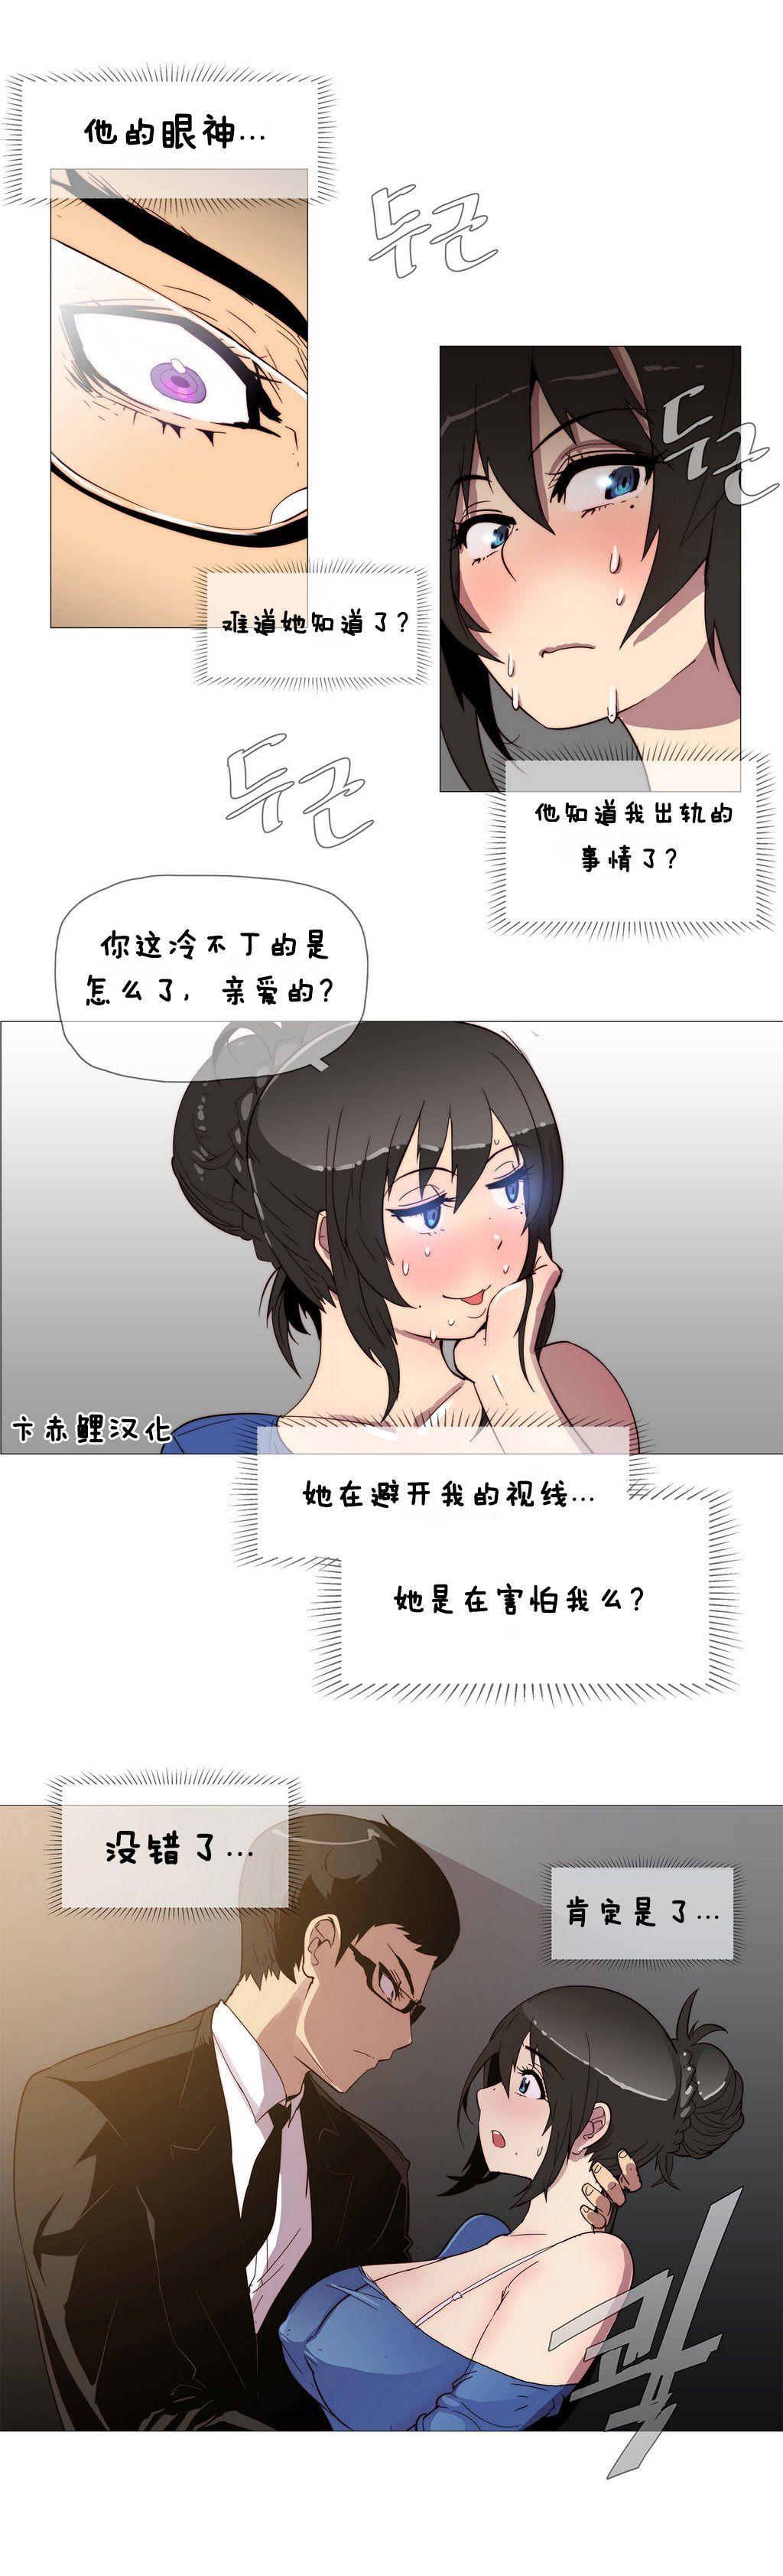 HouseHold Affairs 【卞赤鲤汉化】1~15话 50